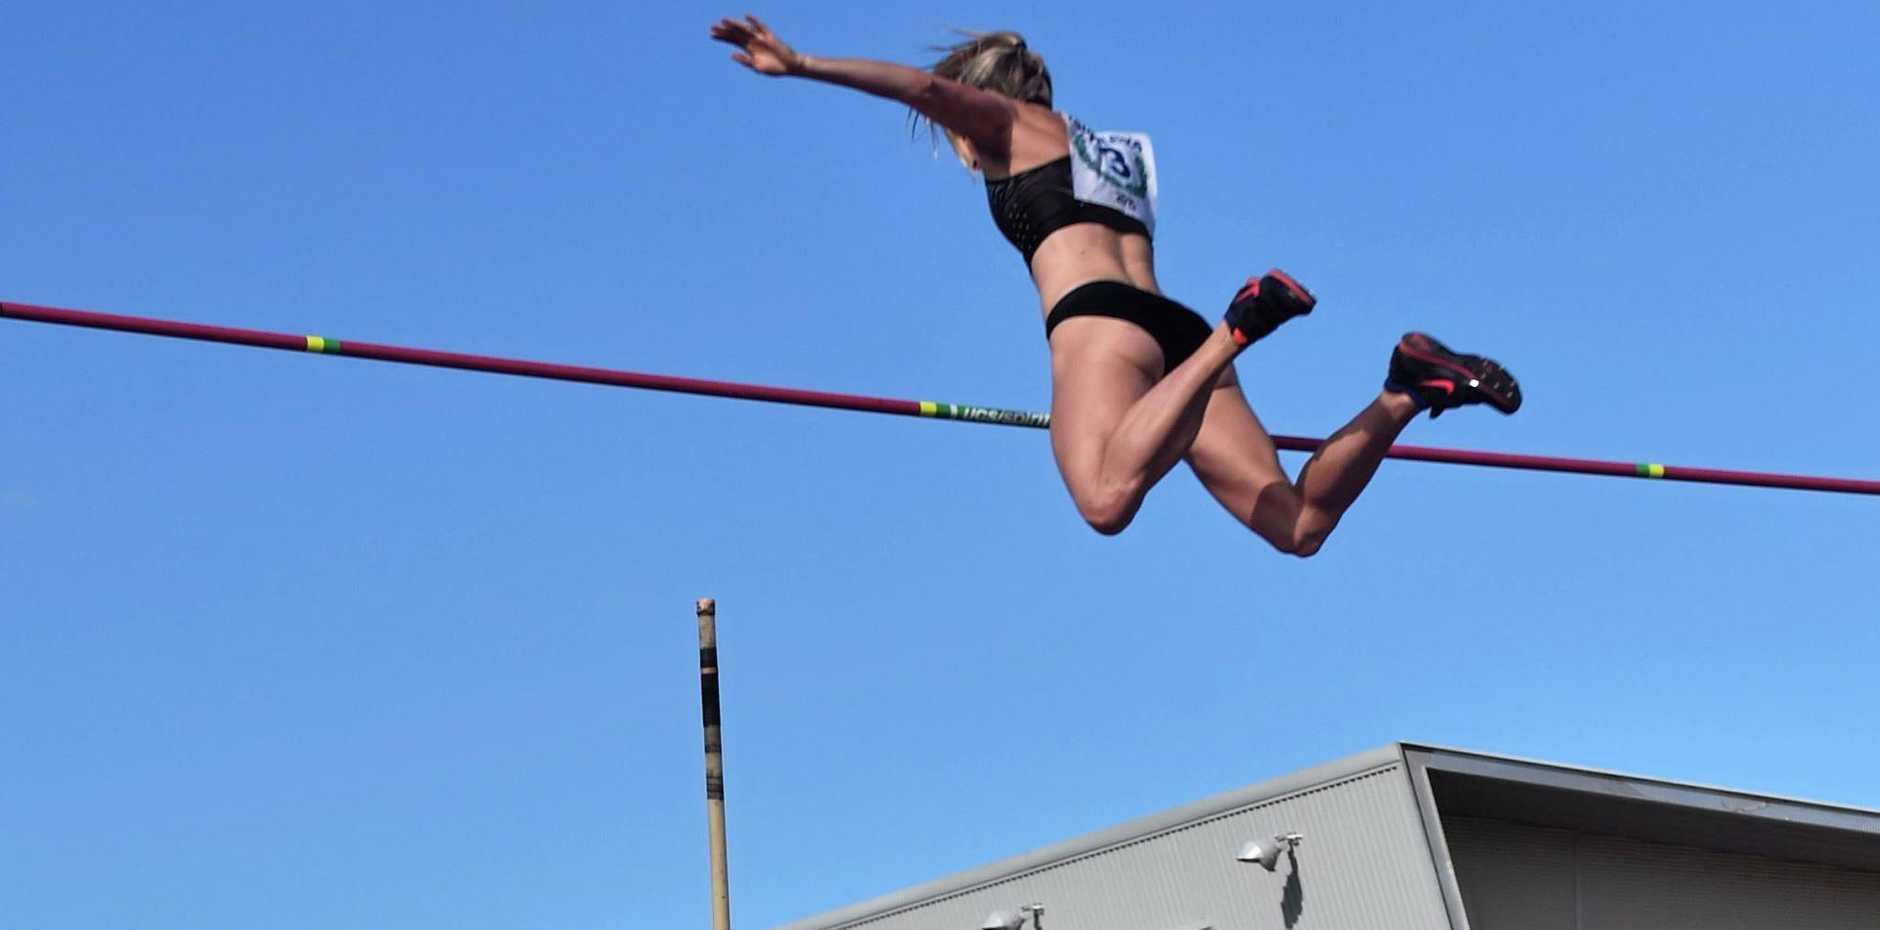 Sunshine Coast athlete Alana Boyd in action ahead of the 2016 Rio Olympics.